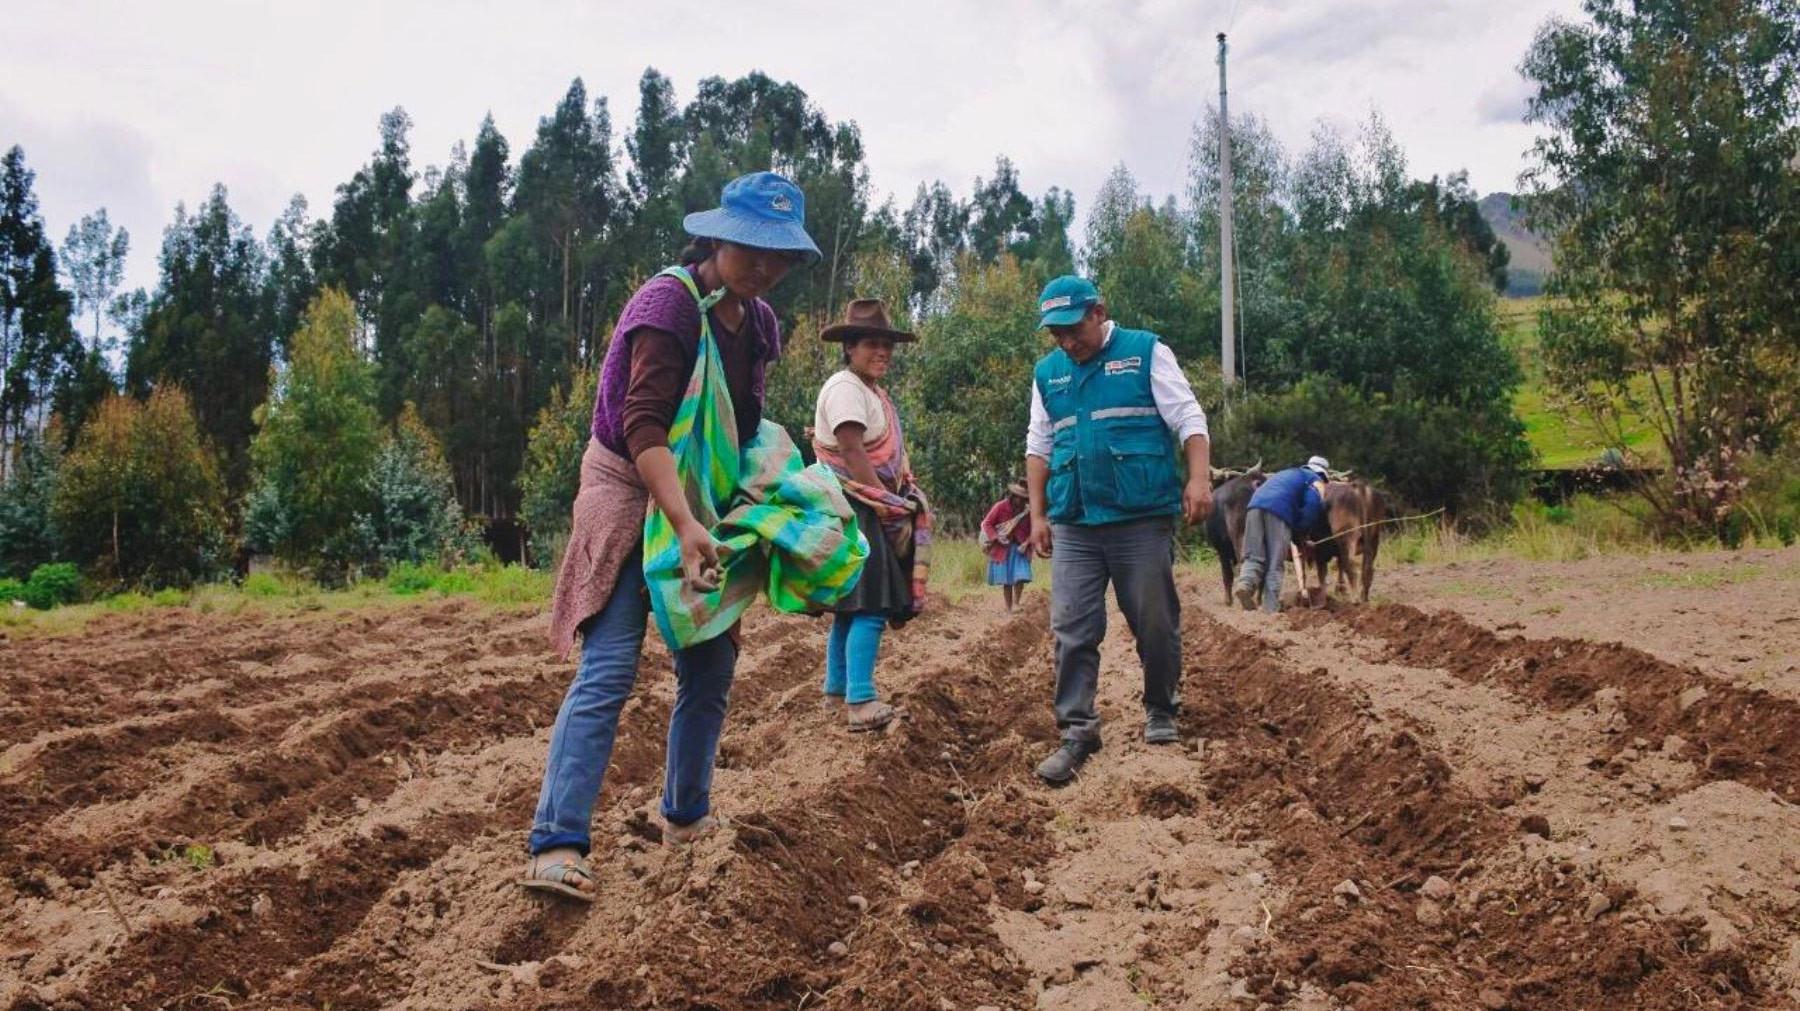 empresas-agroexportadoras-afrontaran-mayor-presion-salarial